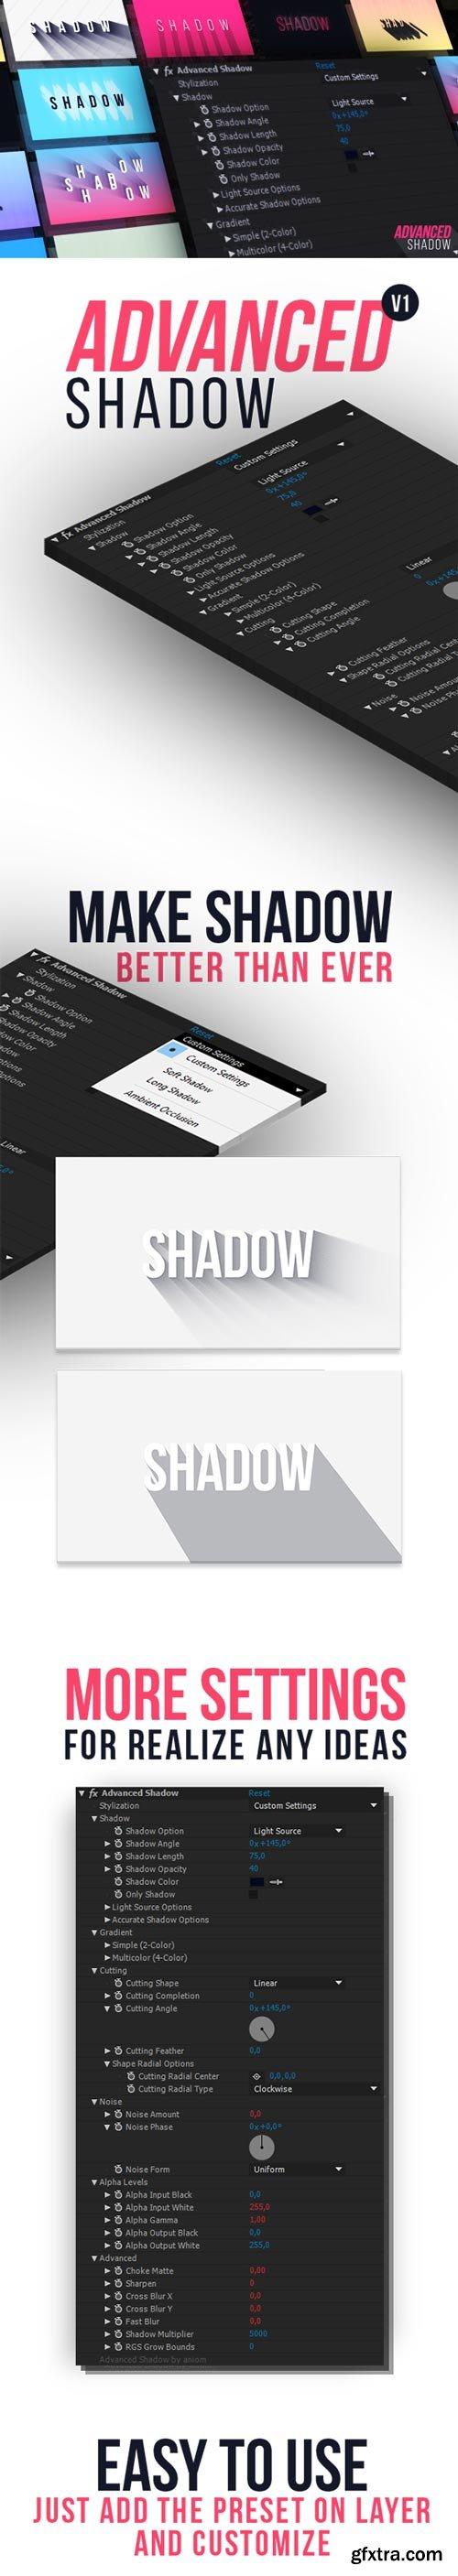 Videohive -Advanced Shadow - 21222364